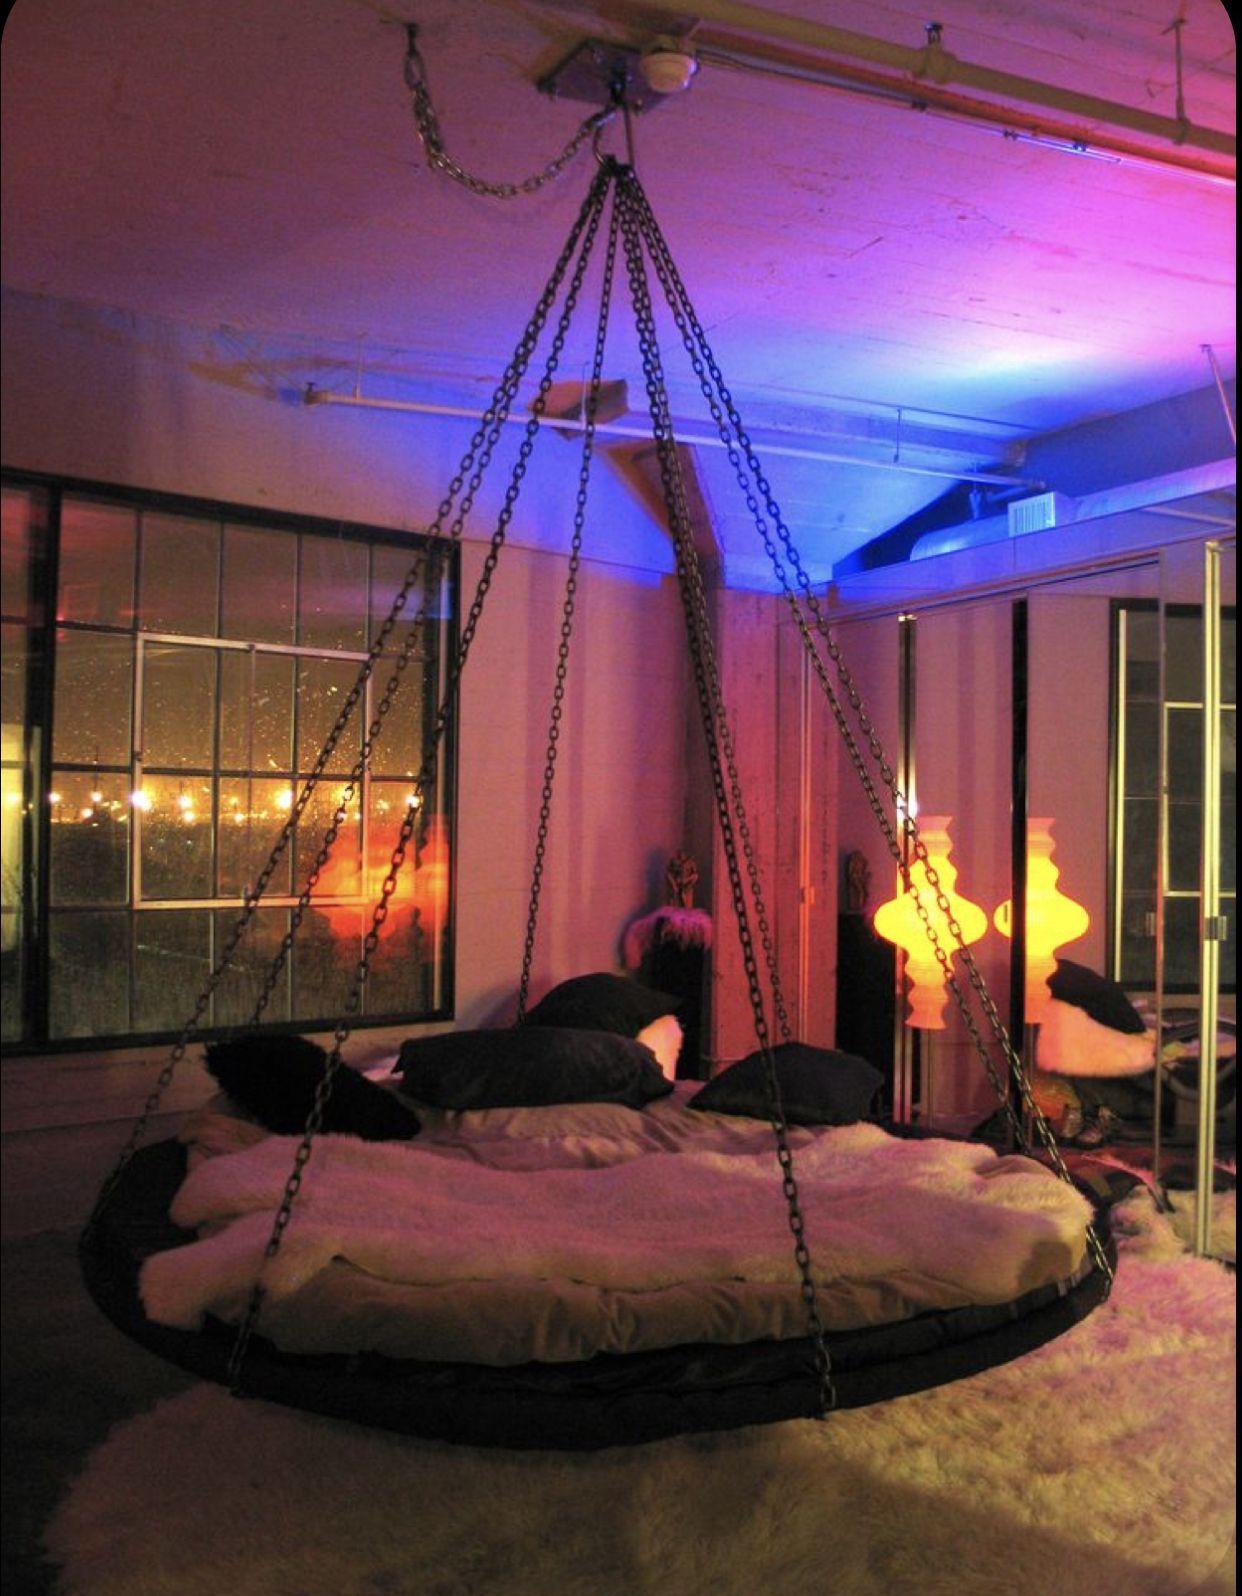 75 Rad Teen Room Ideas & Photos